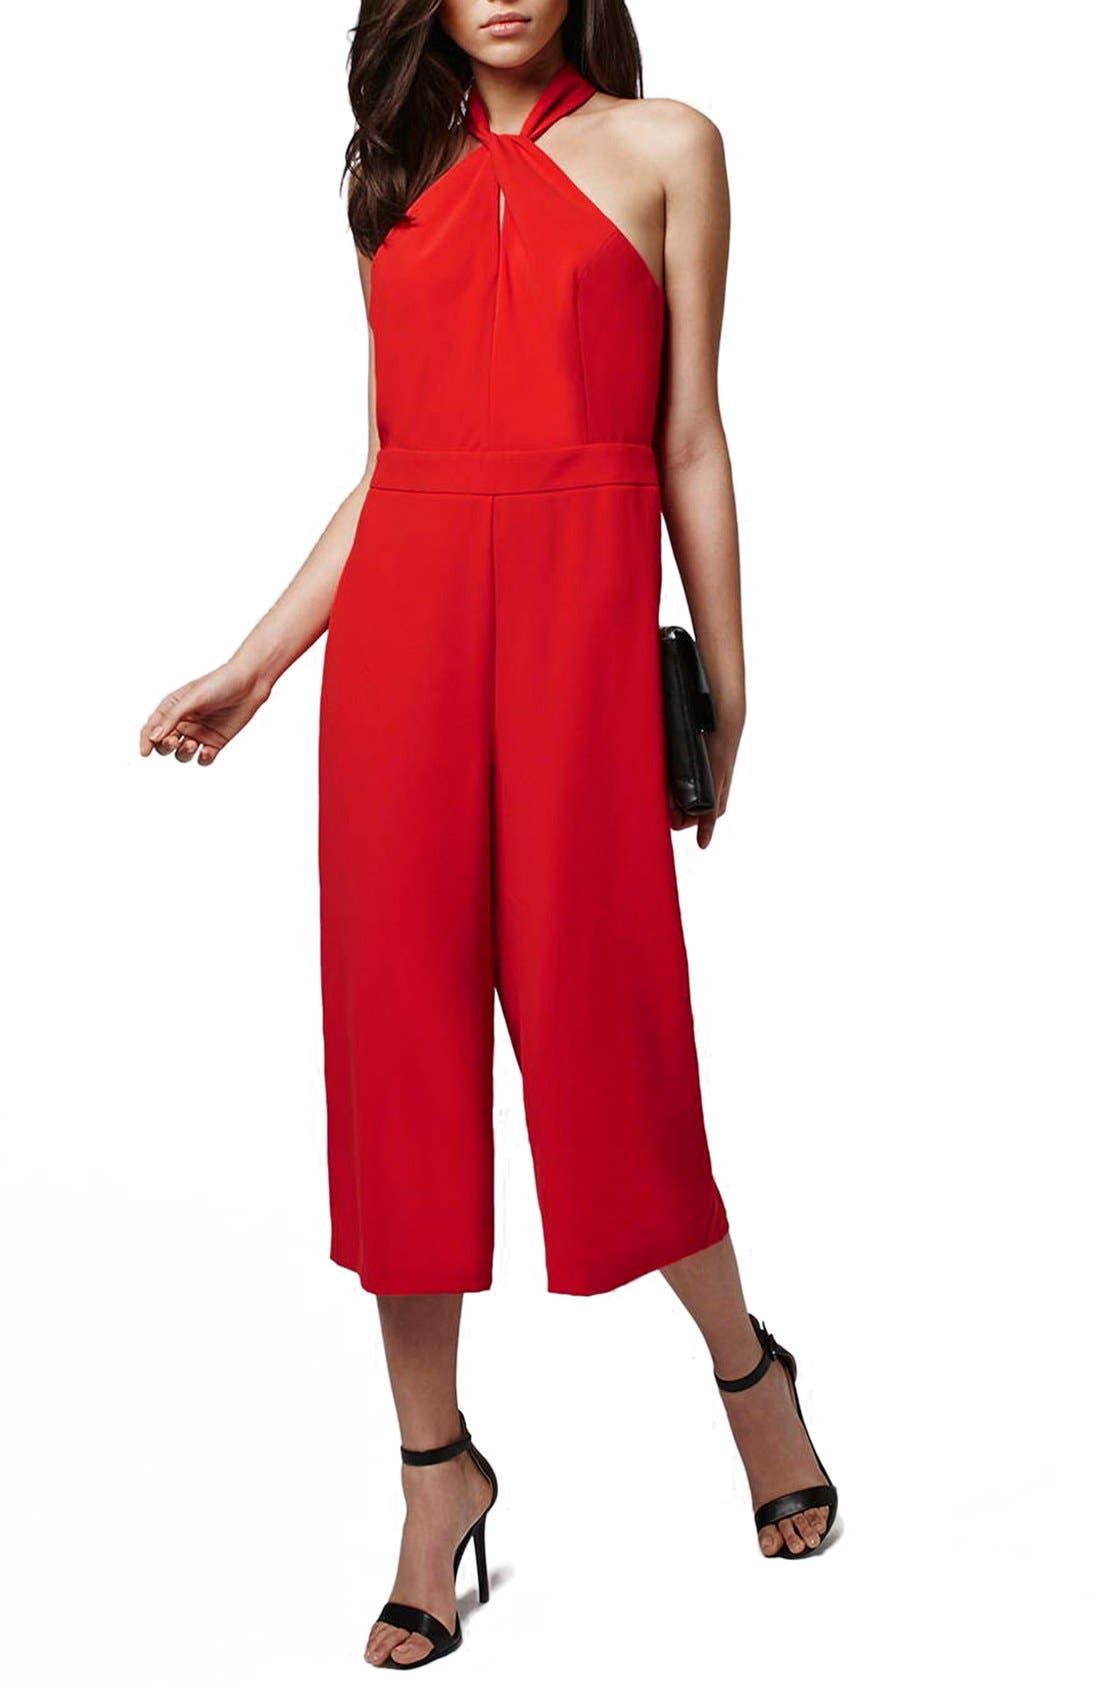 Main Image - Topshop Halter Style Culotte Jumpsuit